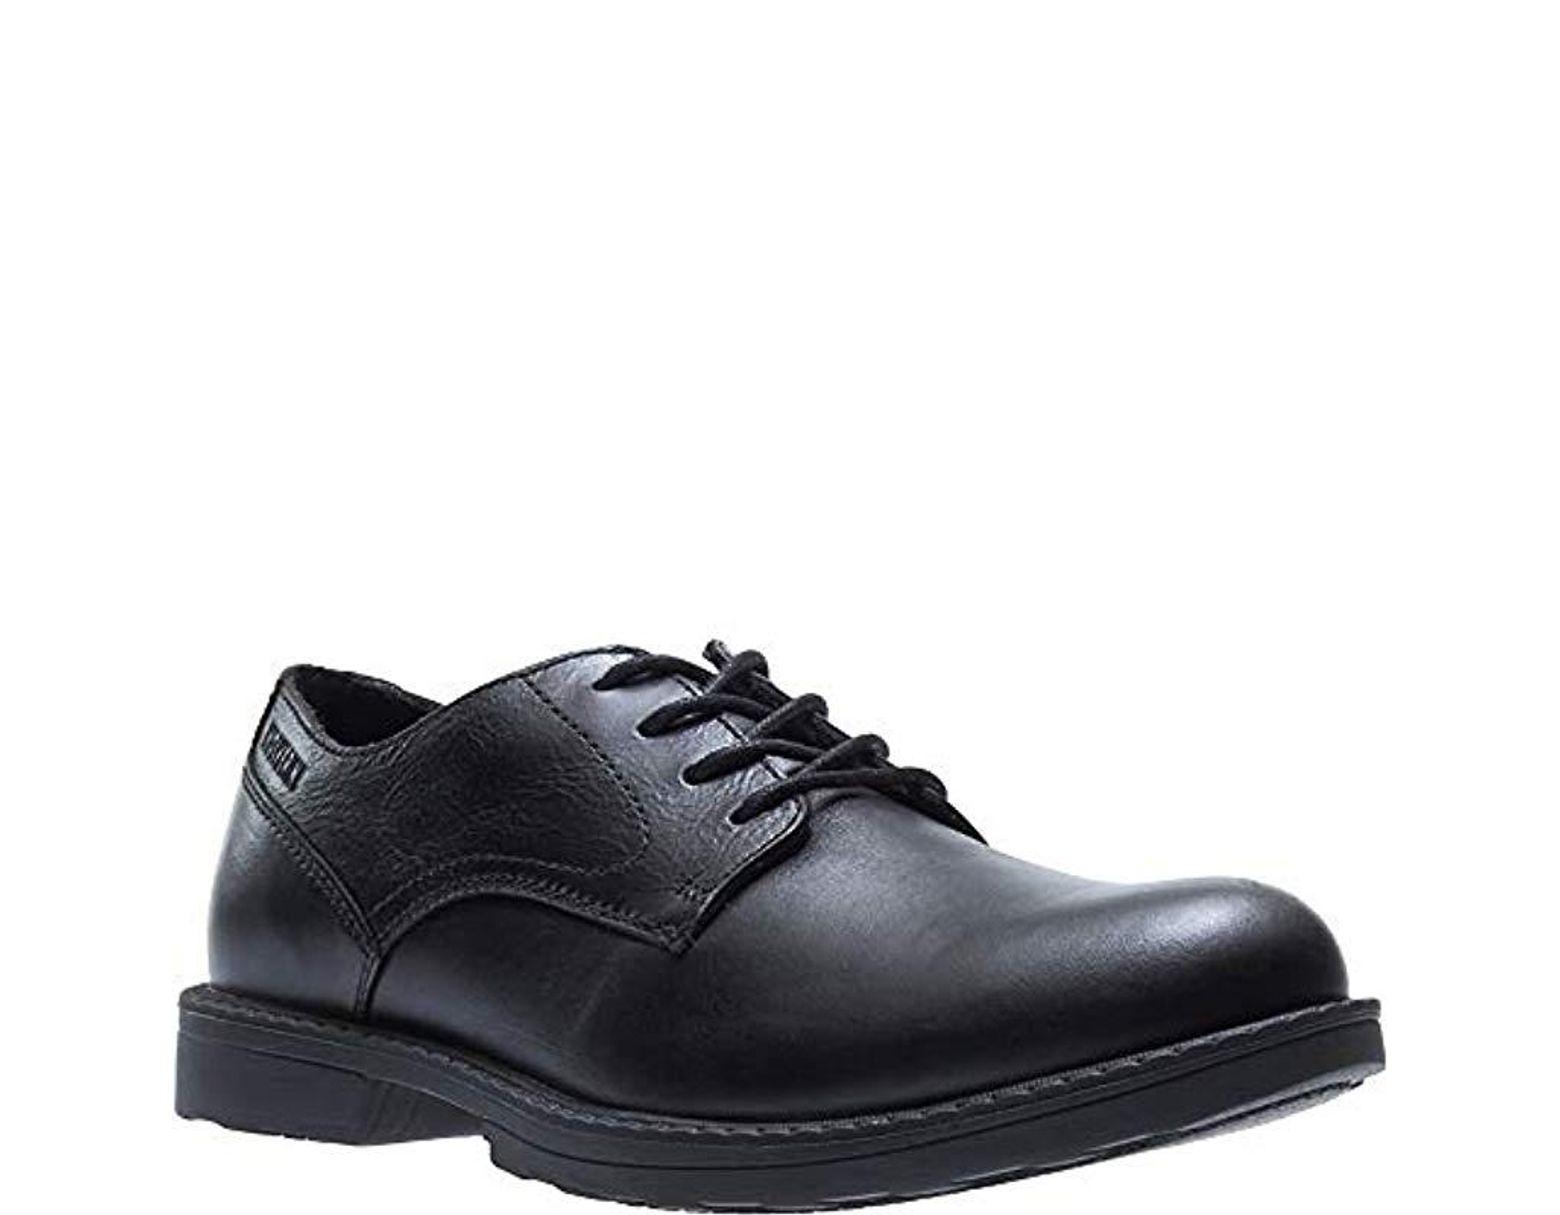 a8fa6d96b70 Wolverine Black Bedford Steel-toe Oxford Sr Industrial Shoe for men